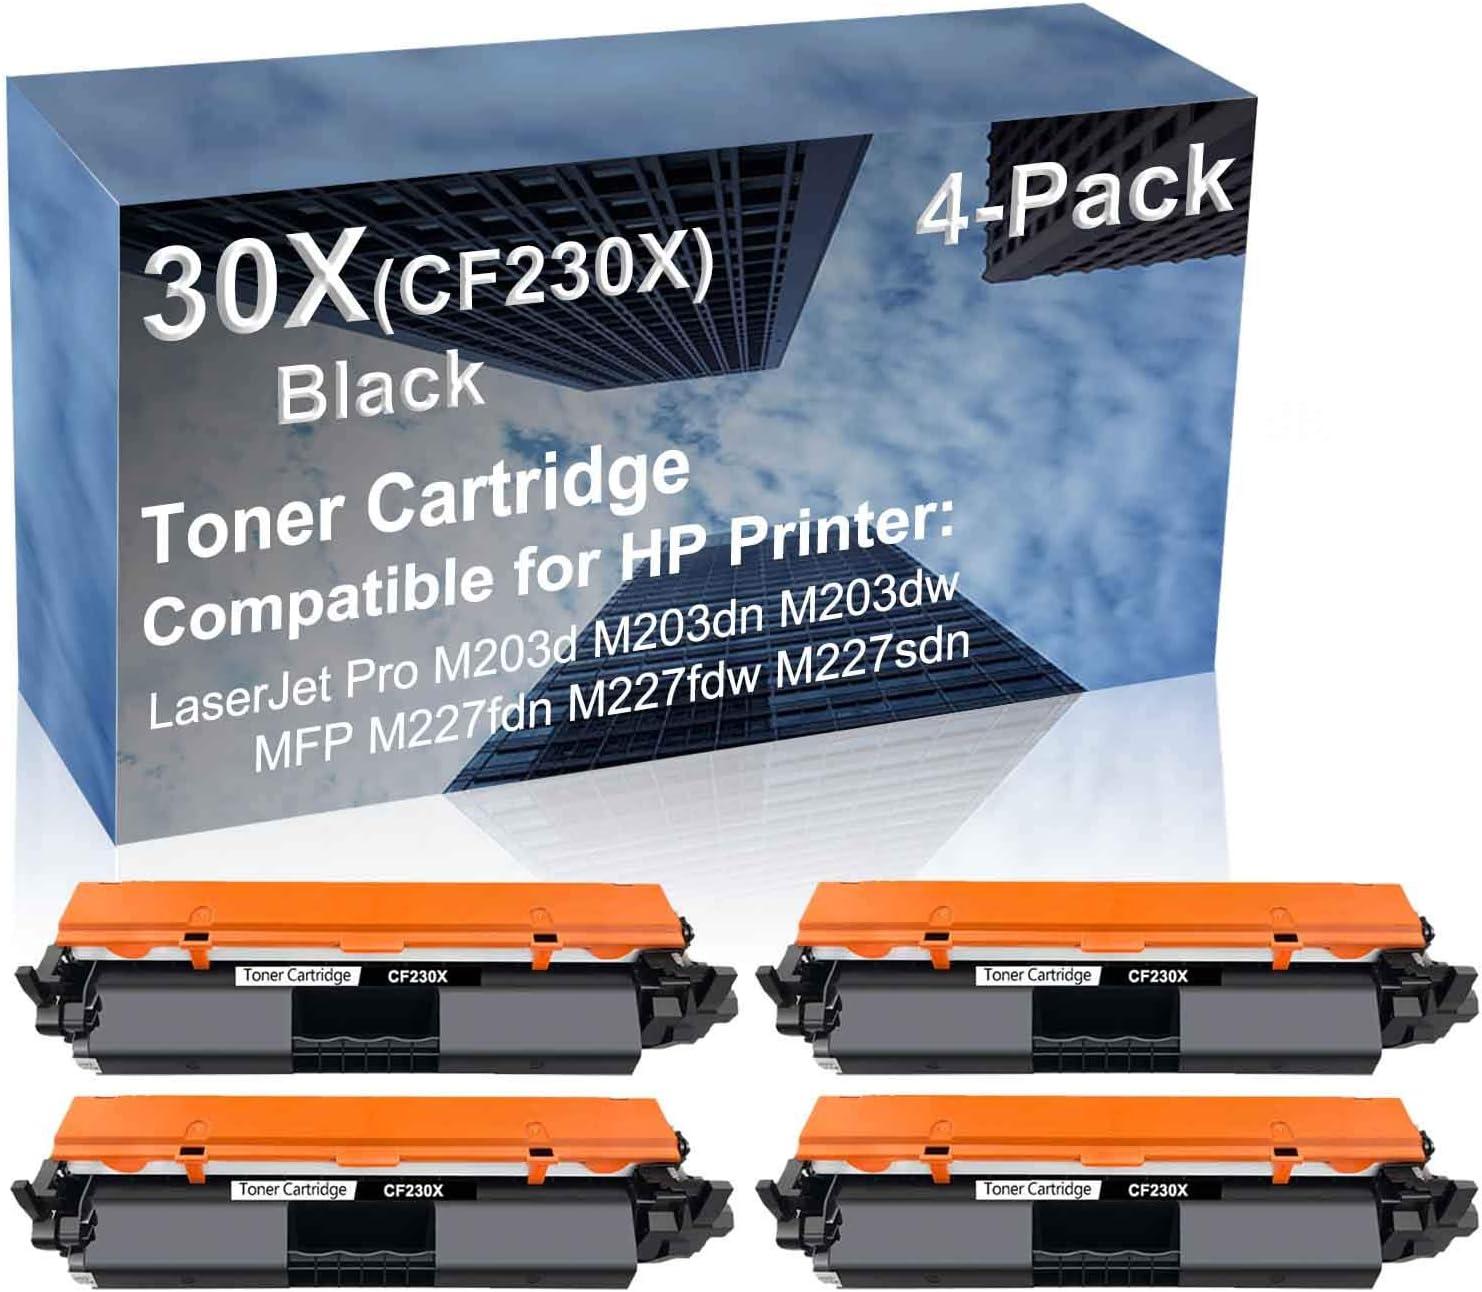 4-Pack Compatible High Yield MFP M227fdw M227sdn?Laser Printer Toner Cartridge Replacement for HP 30X (CF230X) Printer Cartridge (Black)